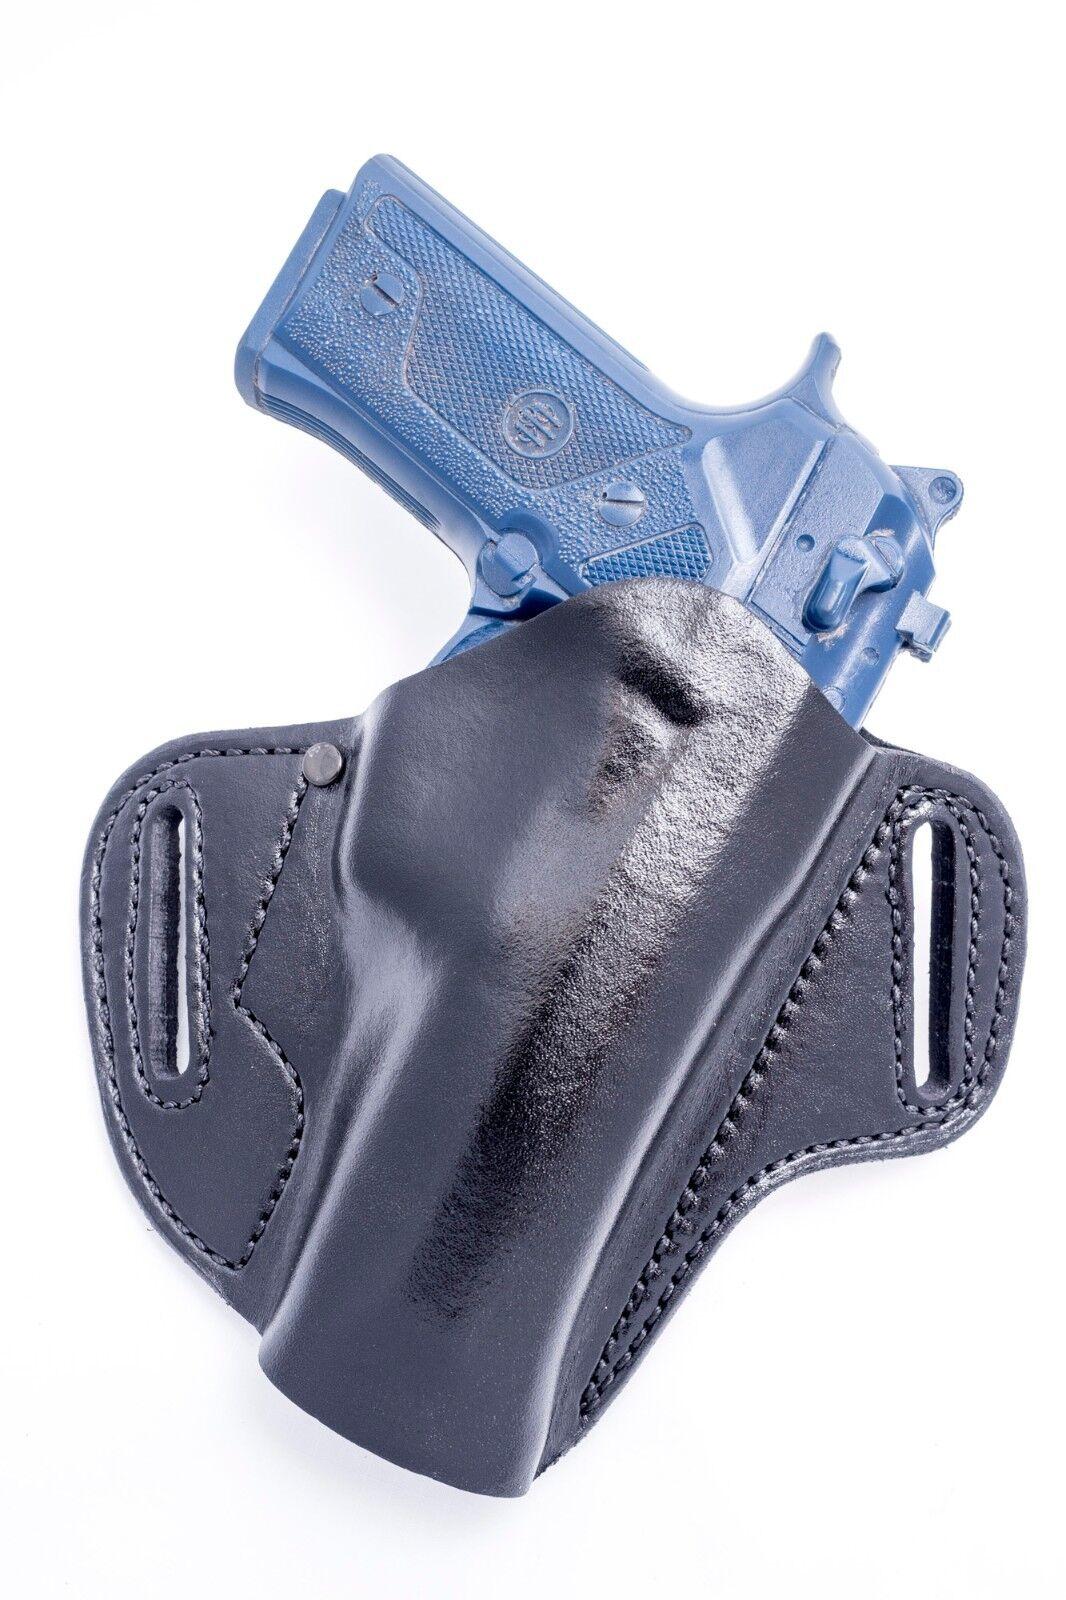 Beretta 92FS 9mm   OUTBAGS Full Grain Leather OWB Pancake Belt Holster. USA MADE